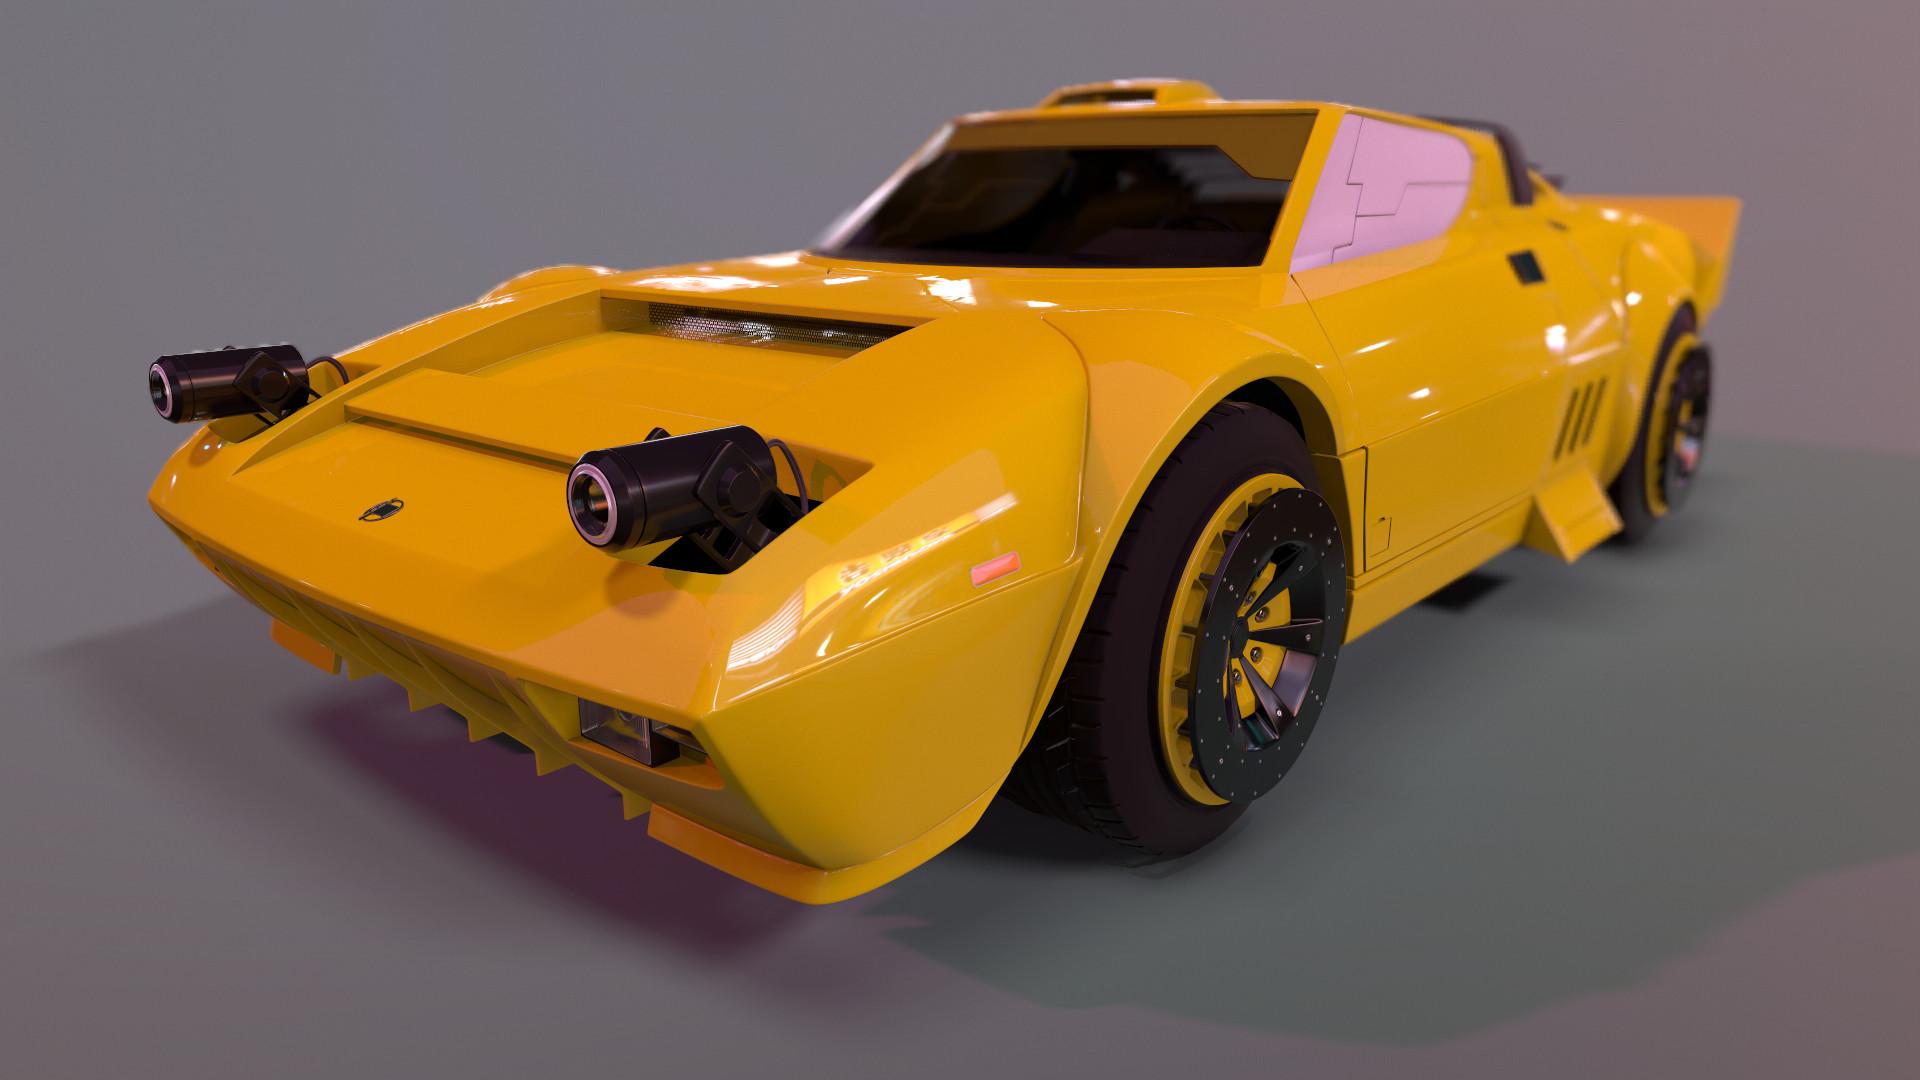 Batou's Car